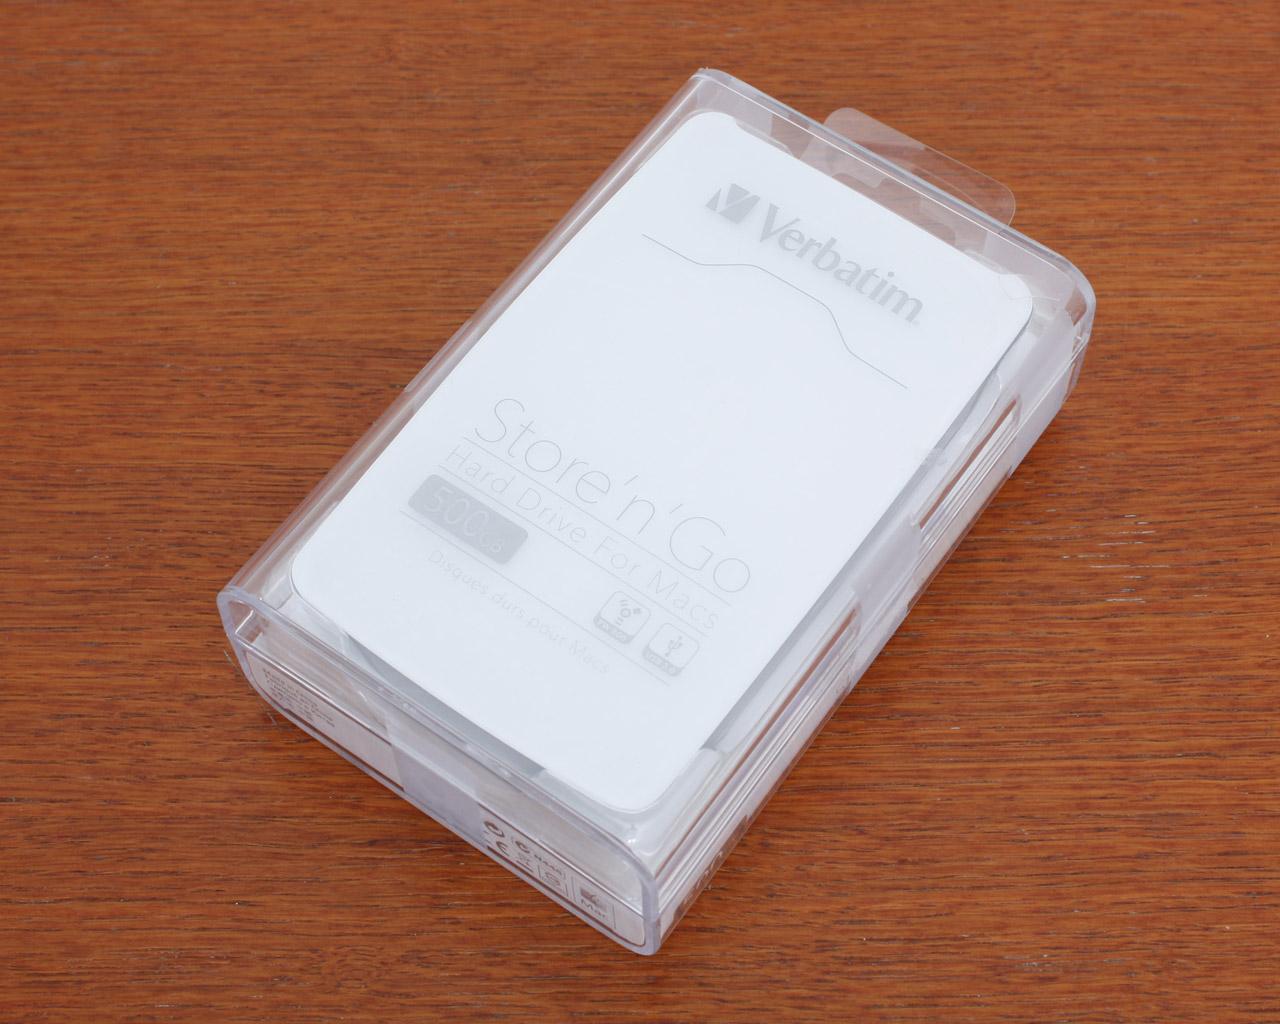 Verbatim store 39 n 39 go for mac 500 gb usb 3 0 fw 800 review for Mac due the box